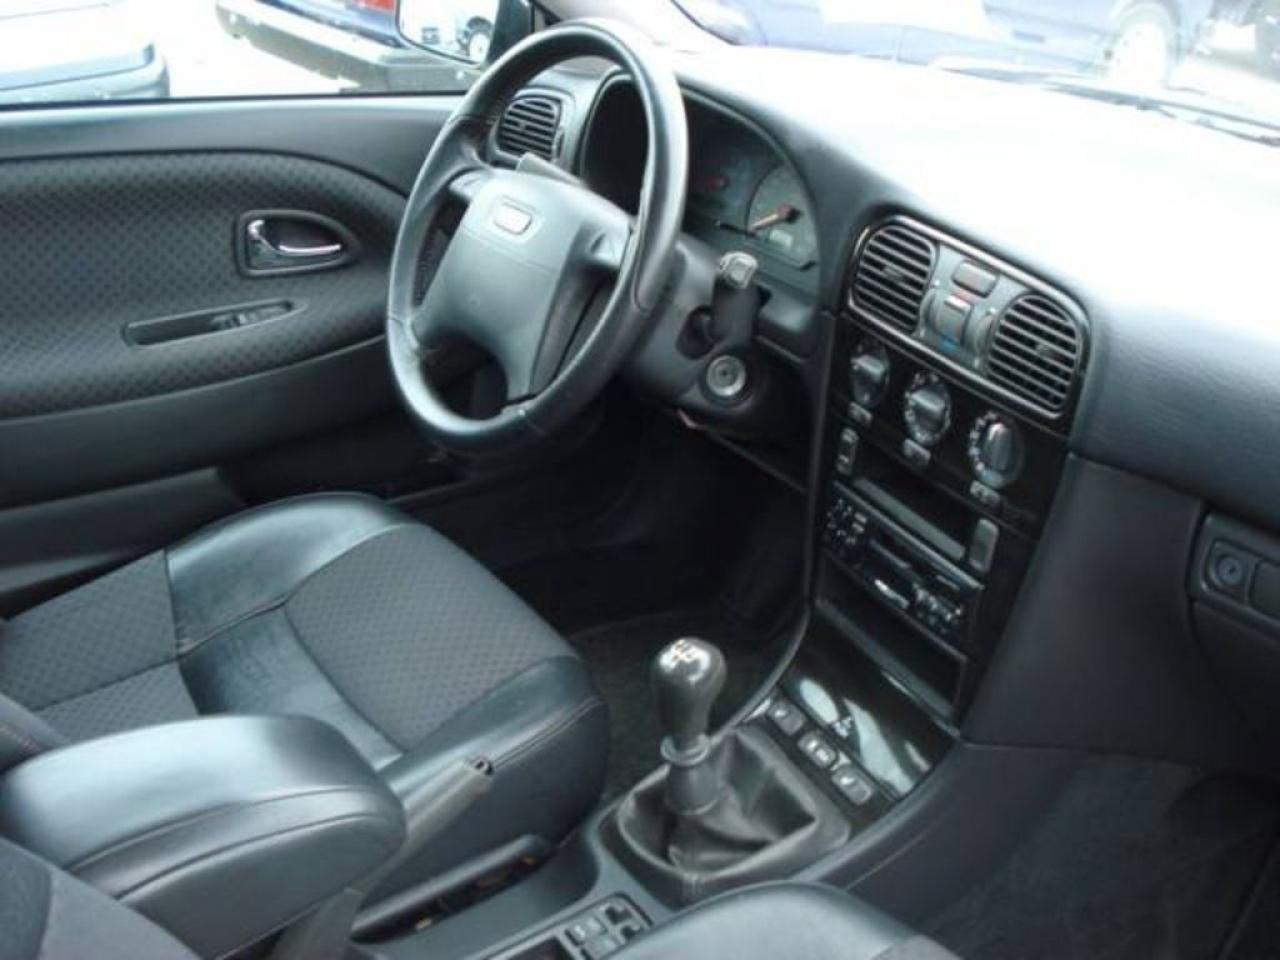 2000 Volvo V40 - Information and photos - ZombieDrive